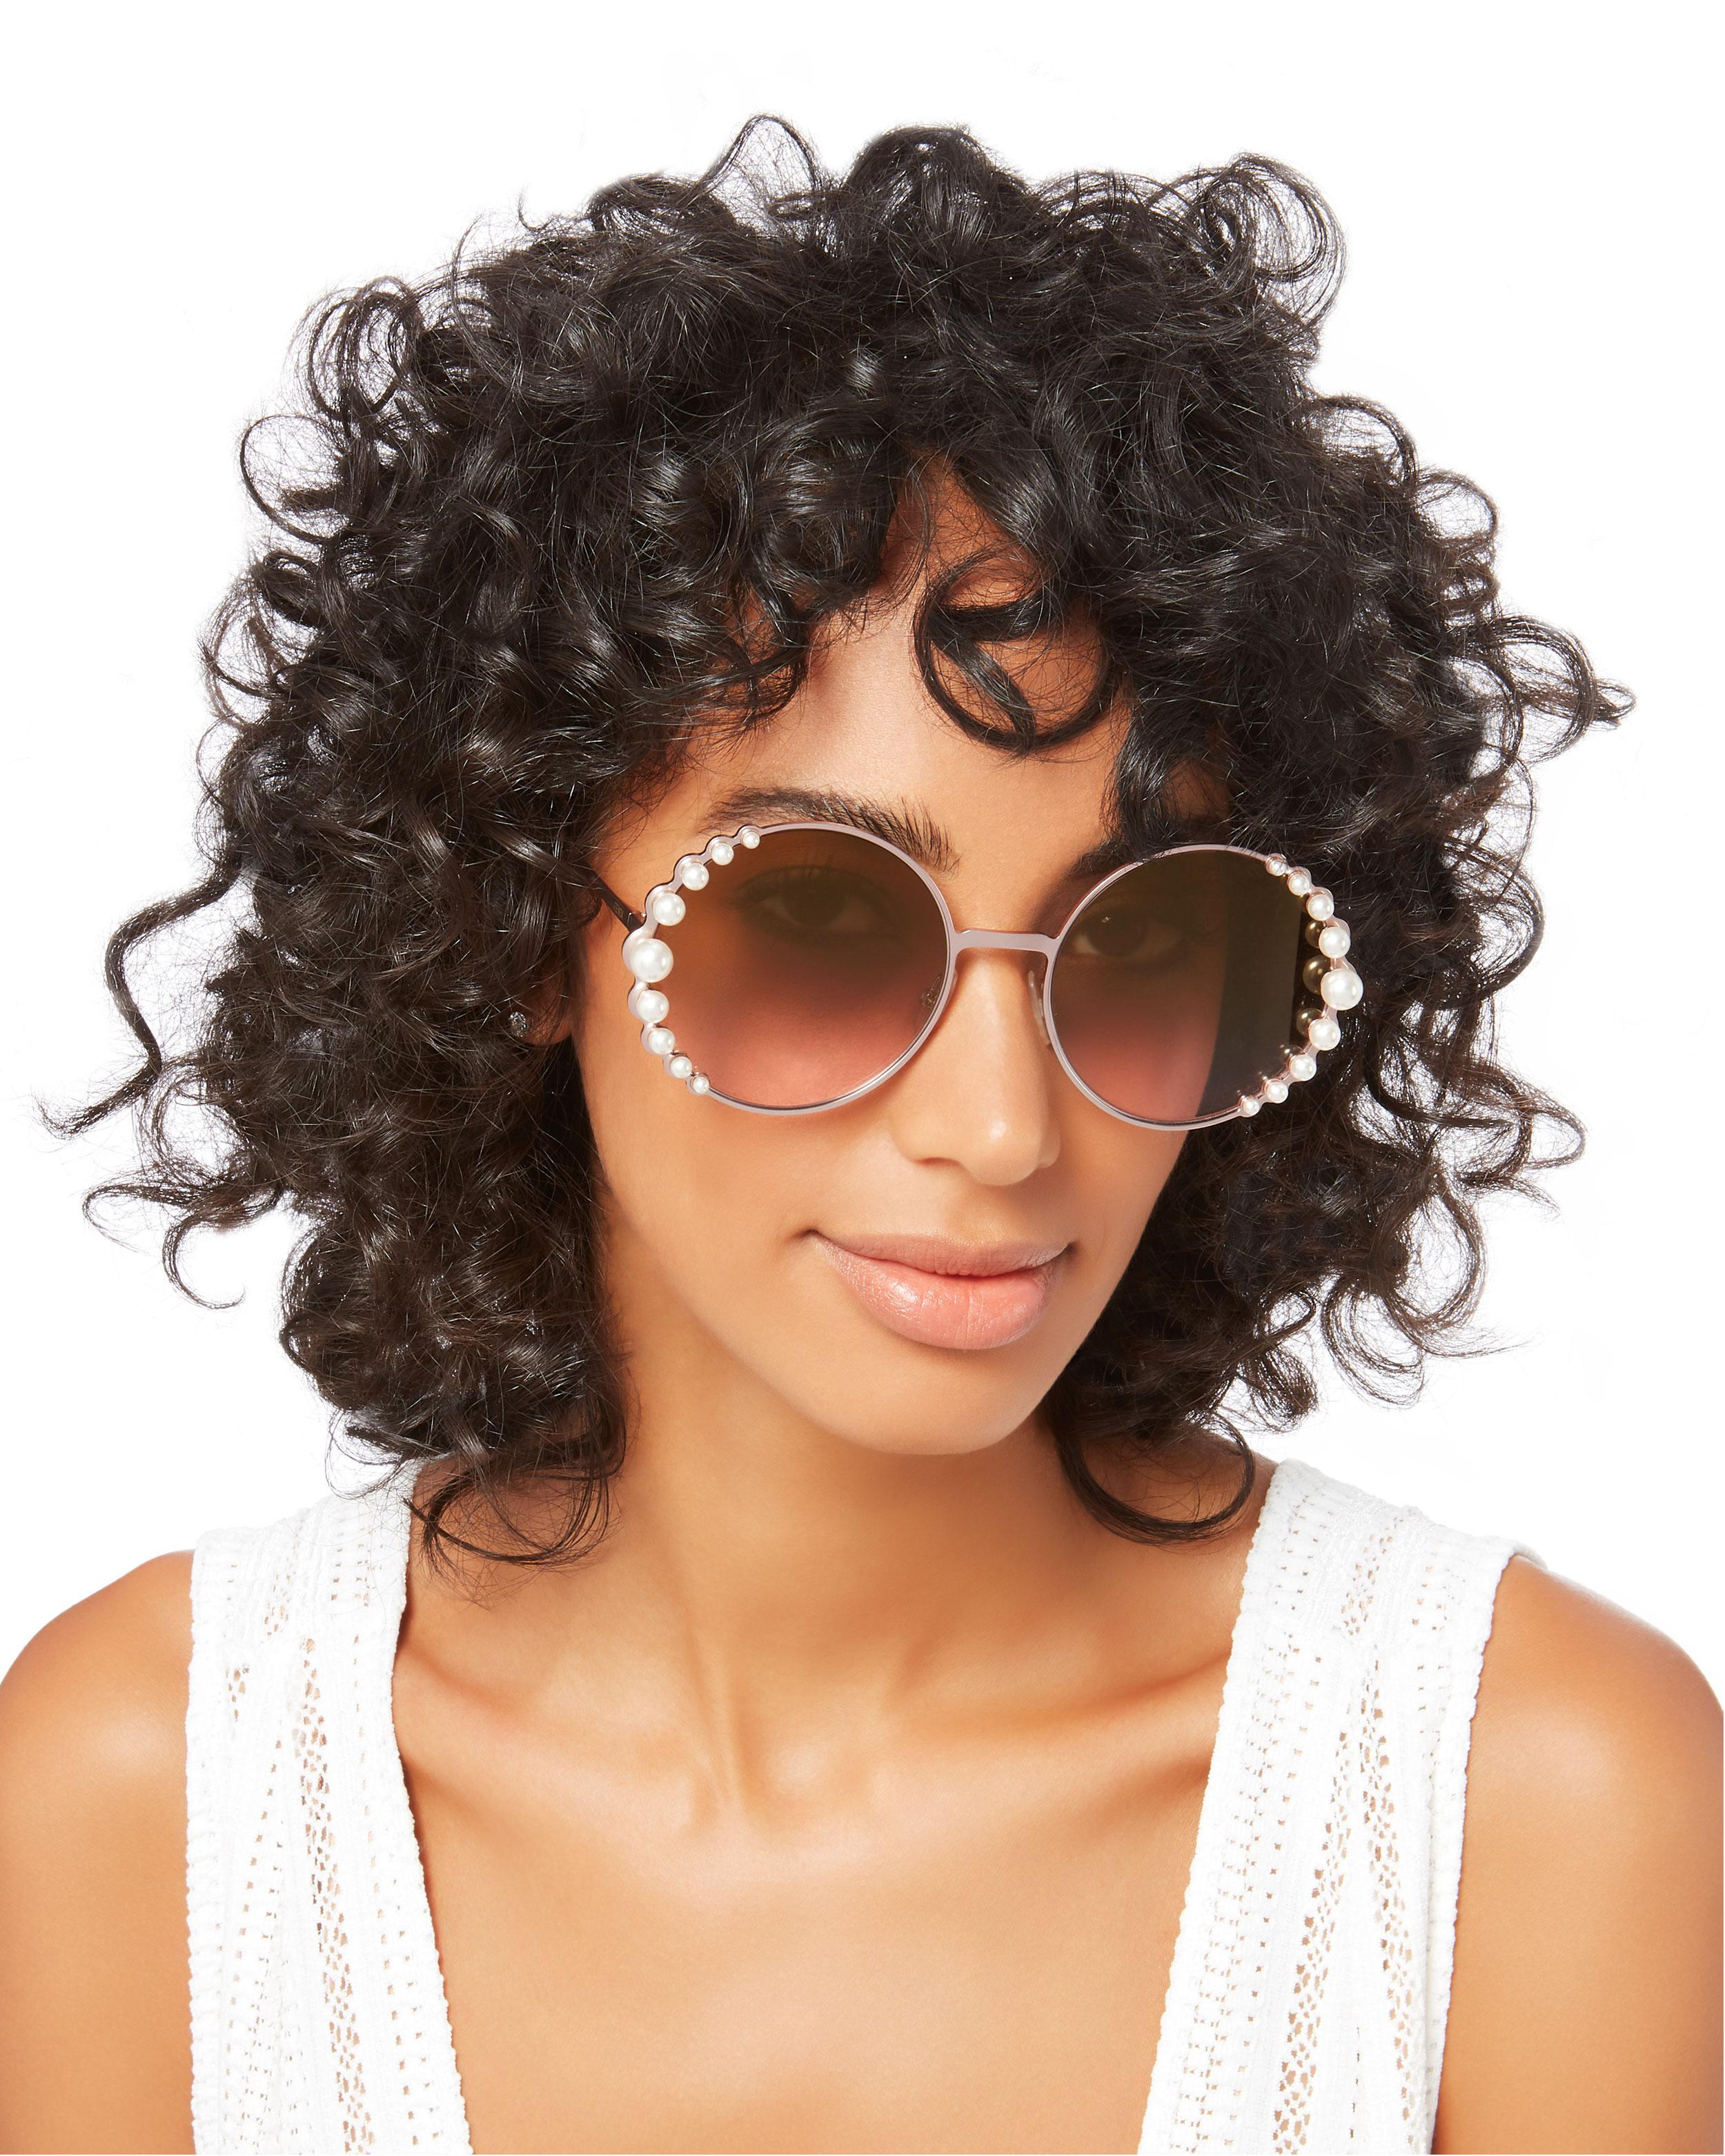 f5ef557c879 Lyst - Fendi Pearl Trim Round Sunglasses in Pink